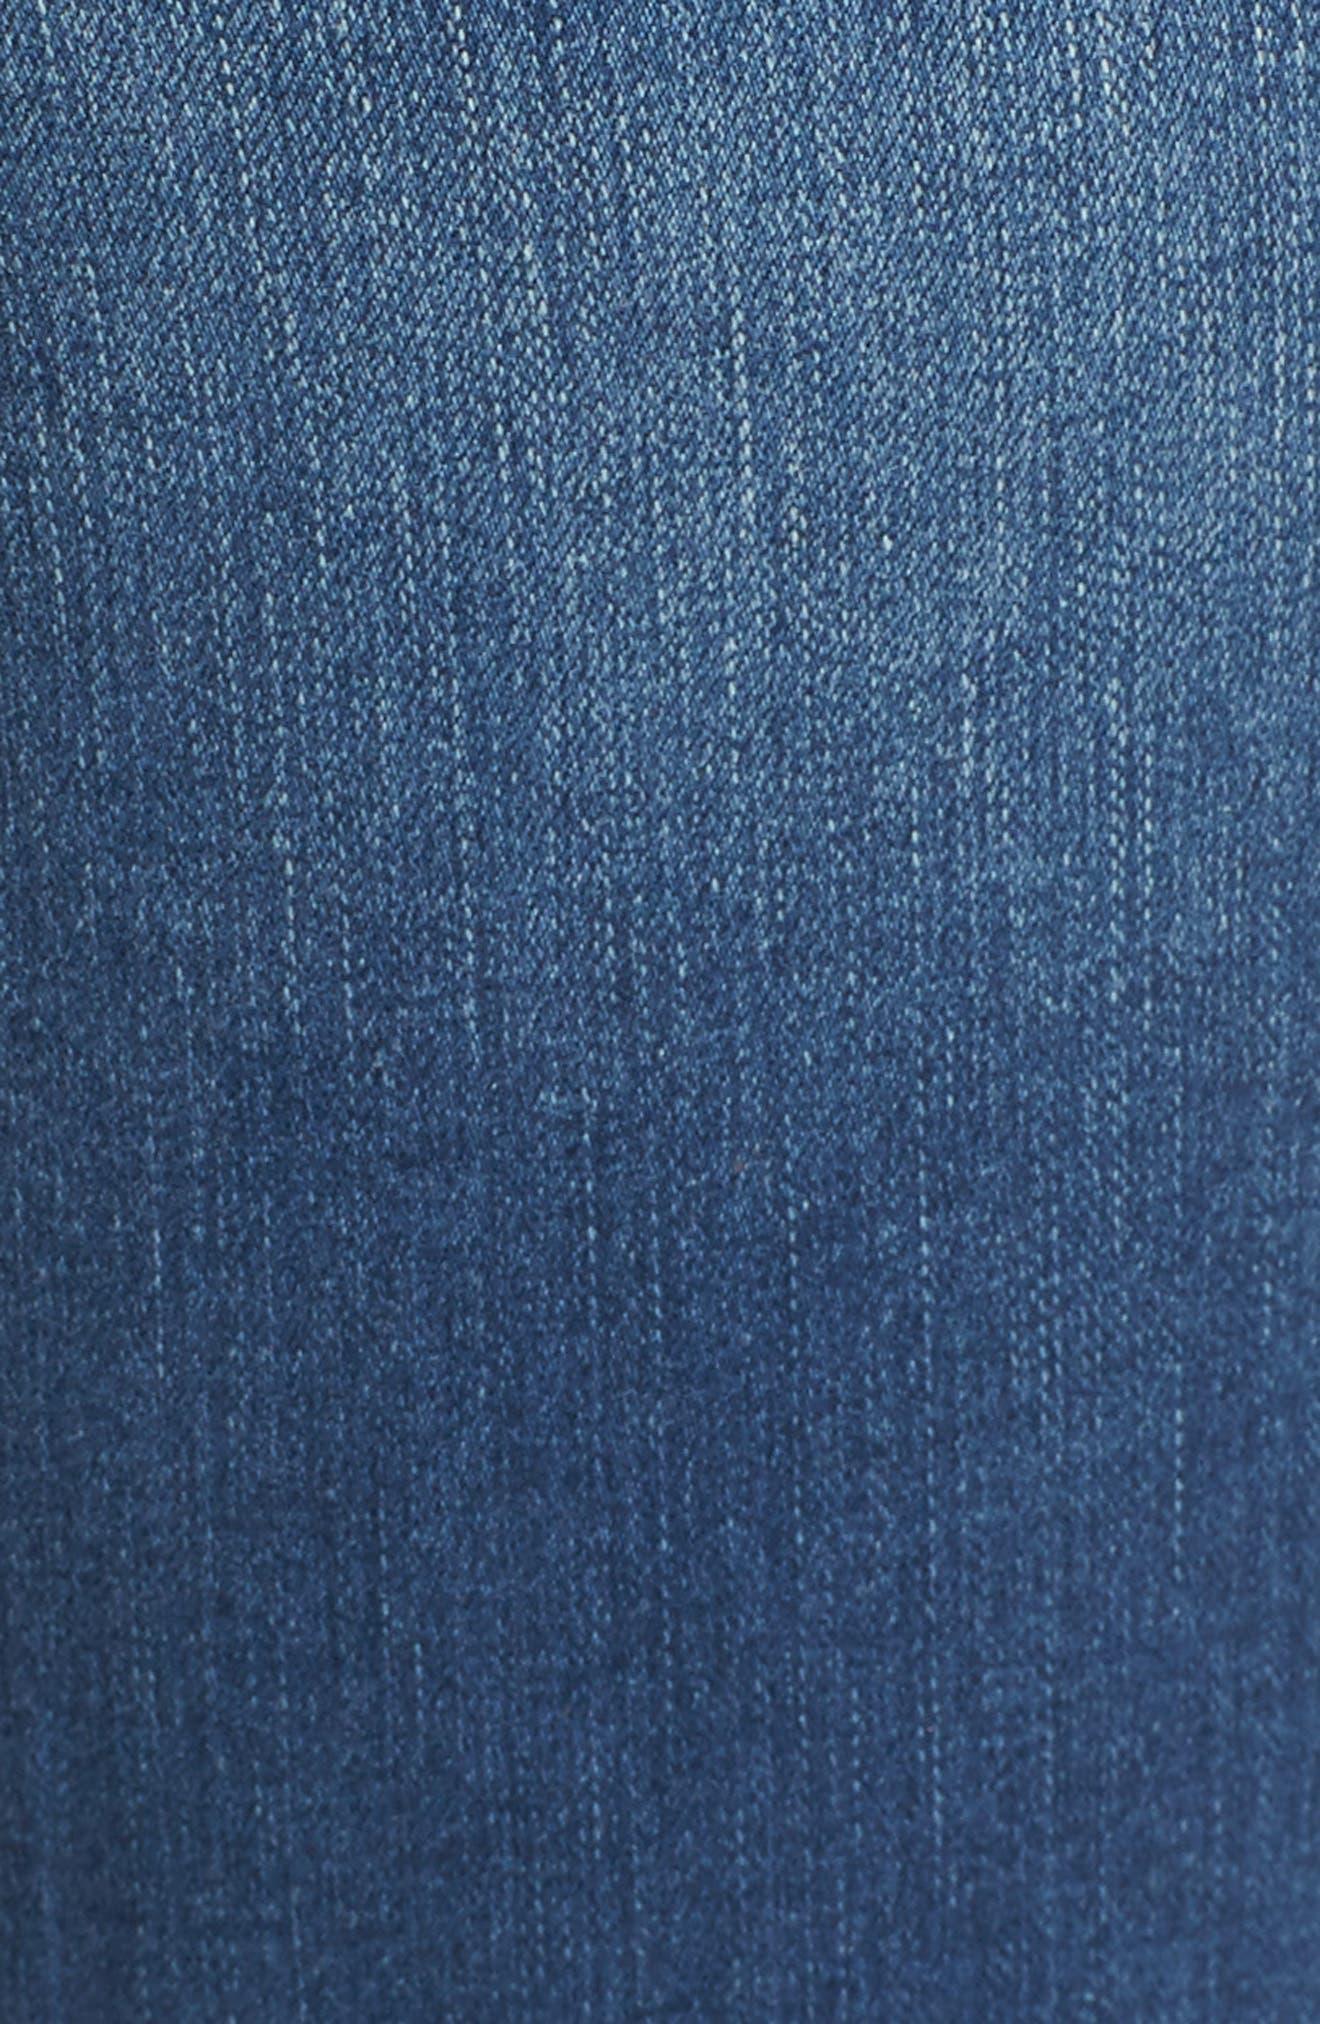 Peri Pull-On Straight Leg Jeans,                             Alternate thumbnail 5, color,                             MEDIUM INDIGO